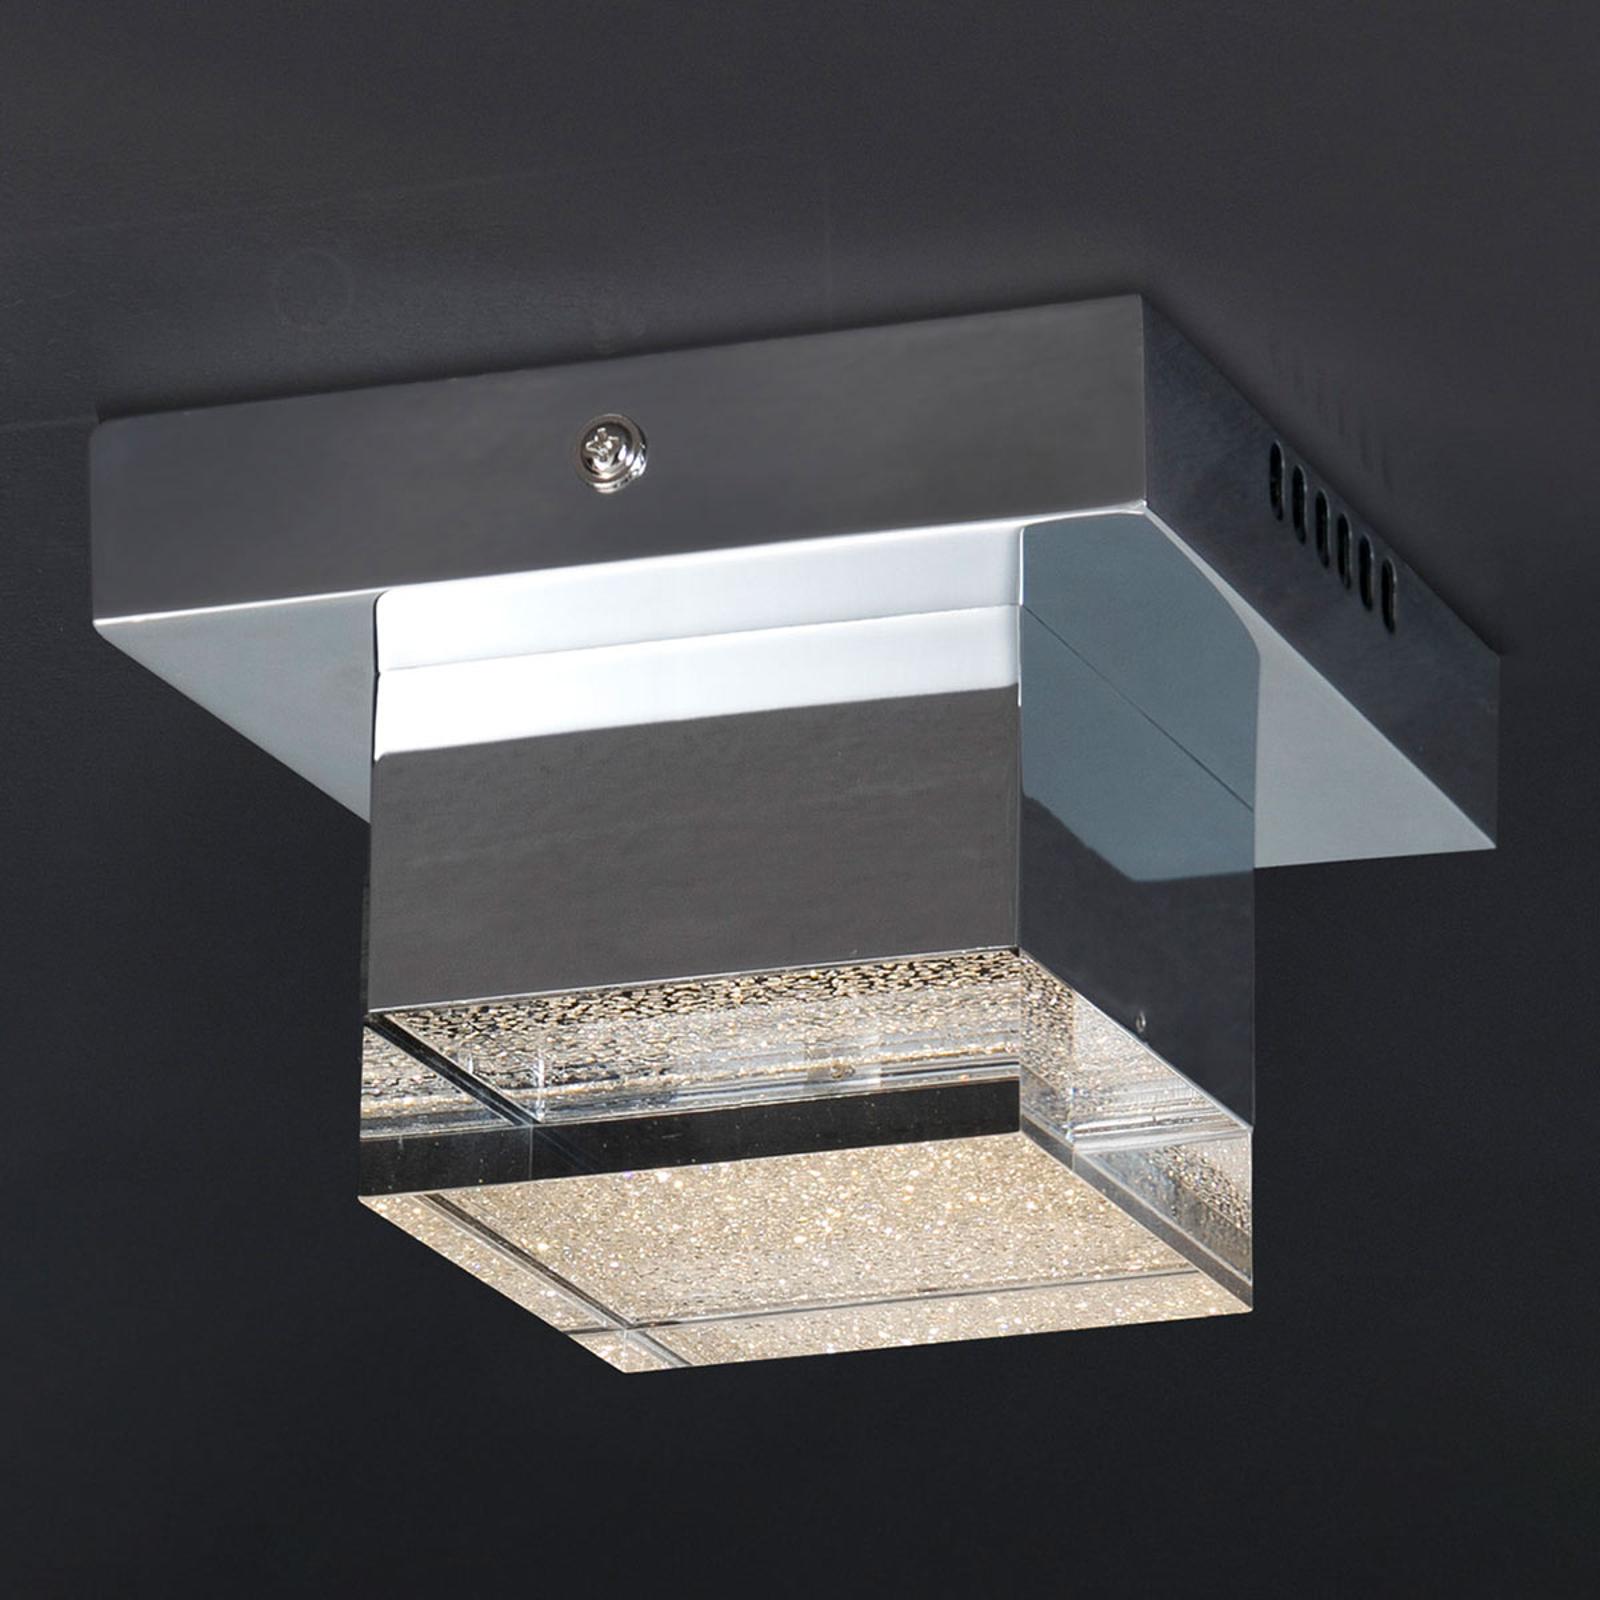 LED plafondlamp Prisma, 1-lamp